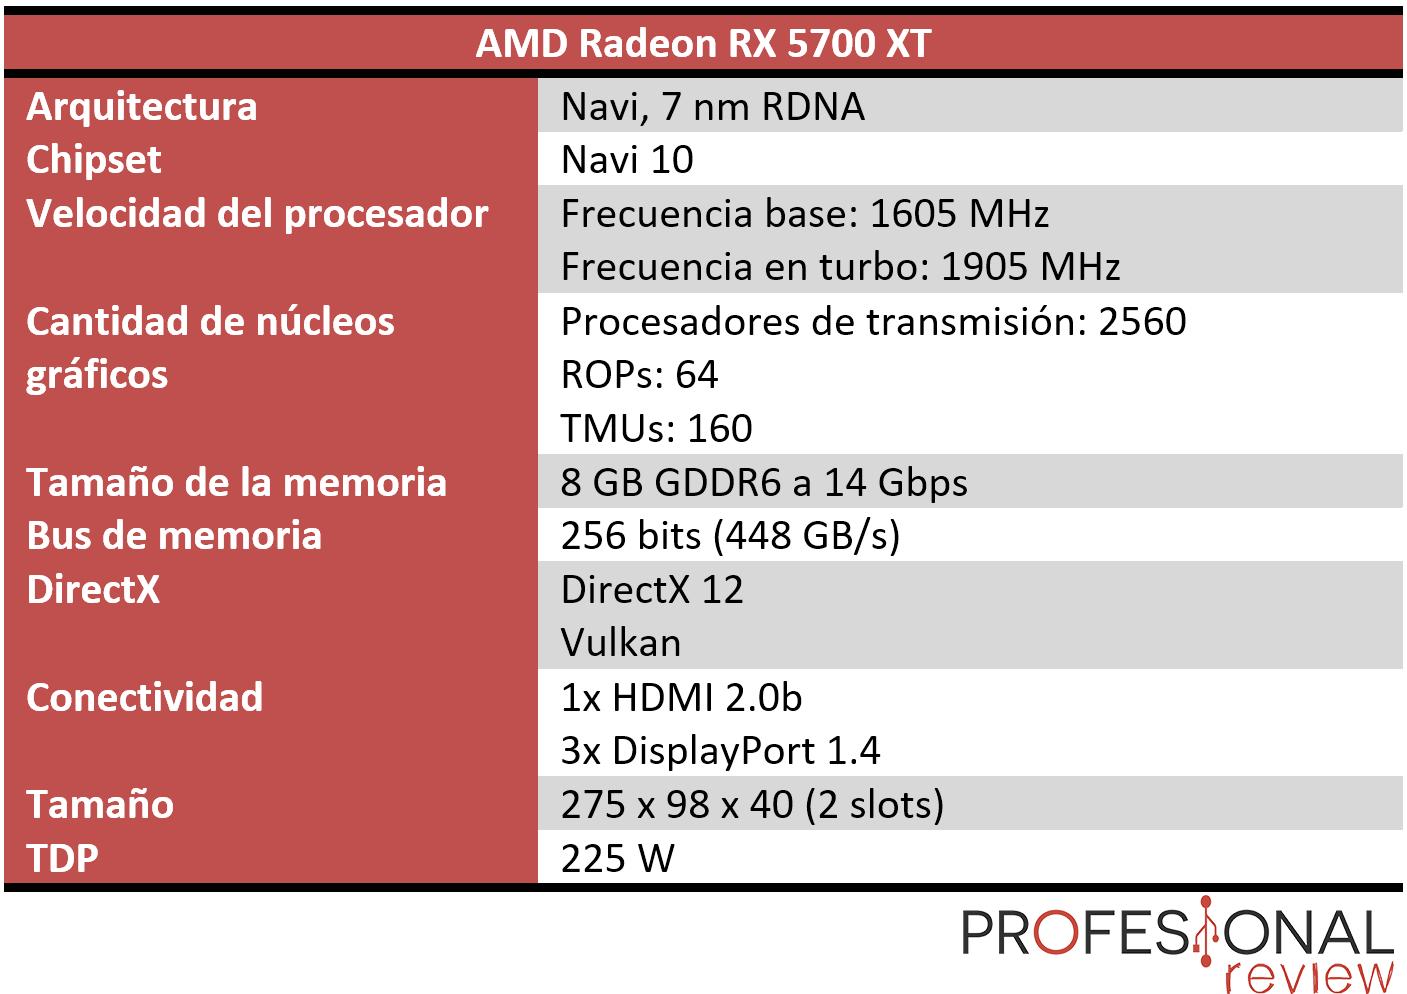 AMD Radeon RX 5700 XT características